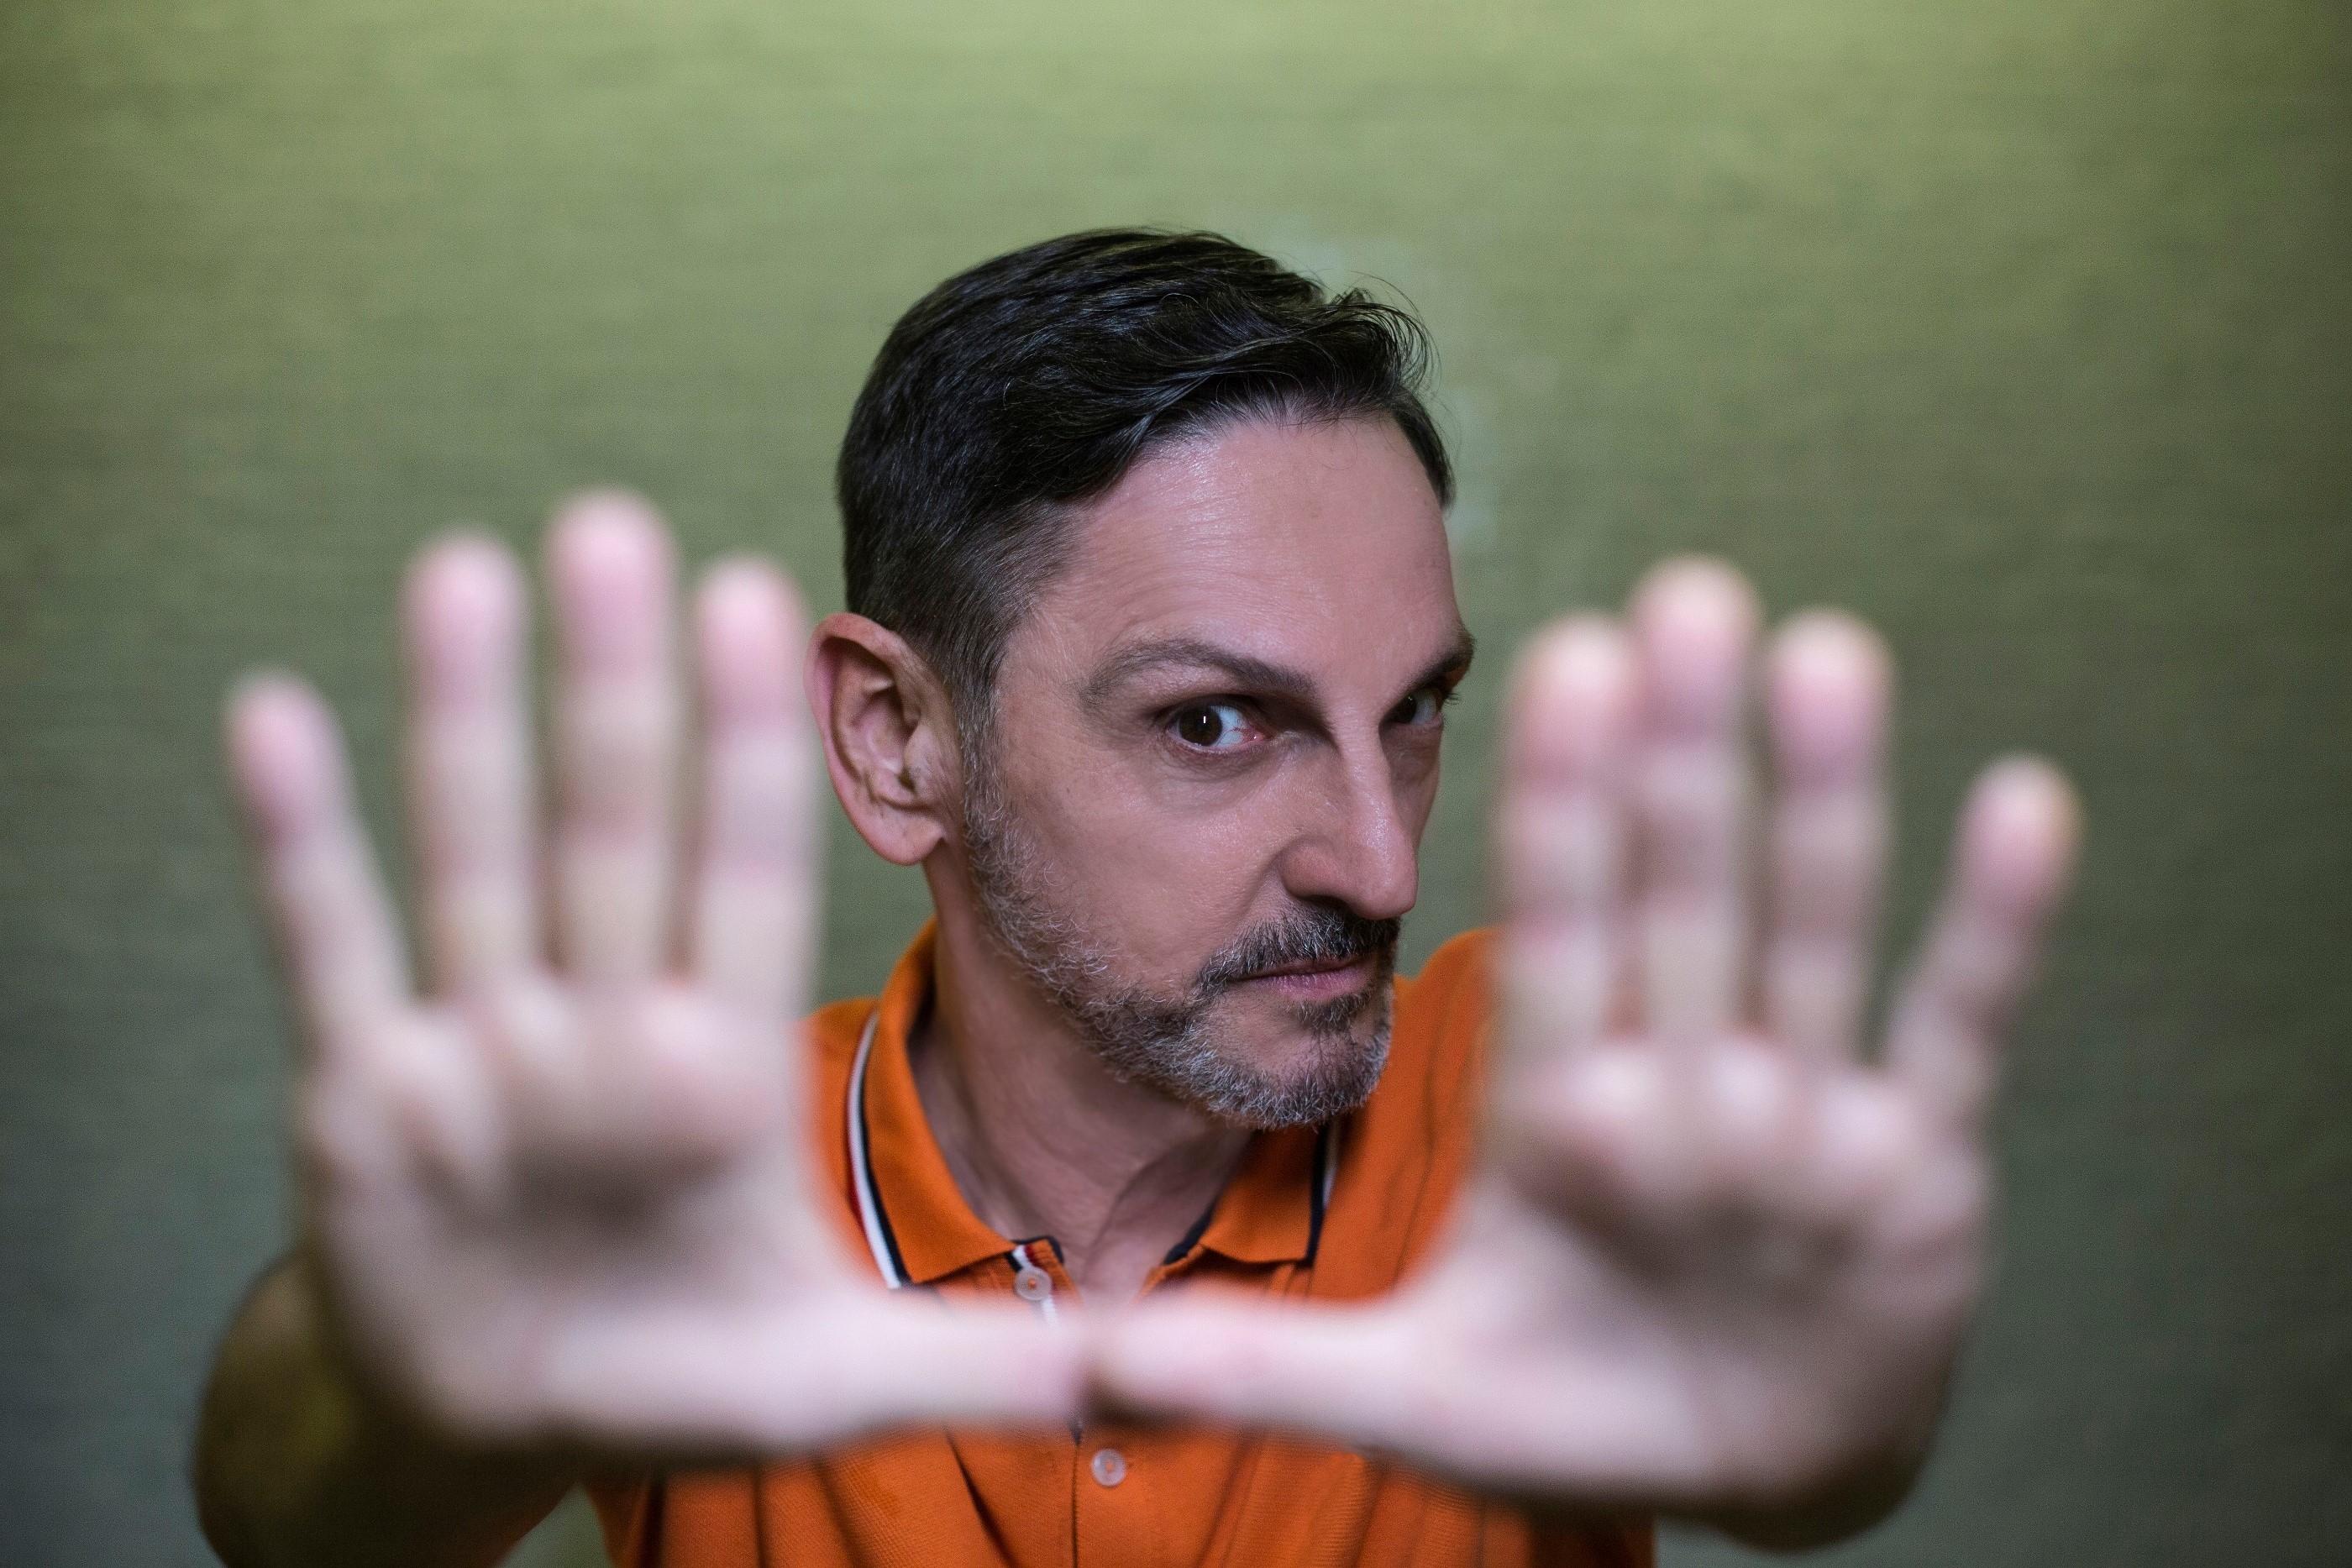 Paulo Miklos Turnê - A Gente Mora No Agora